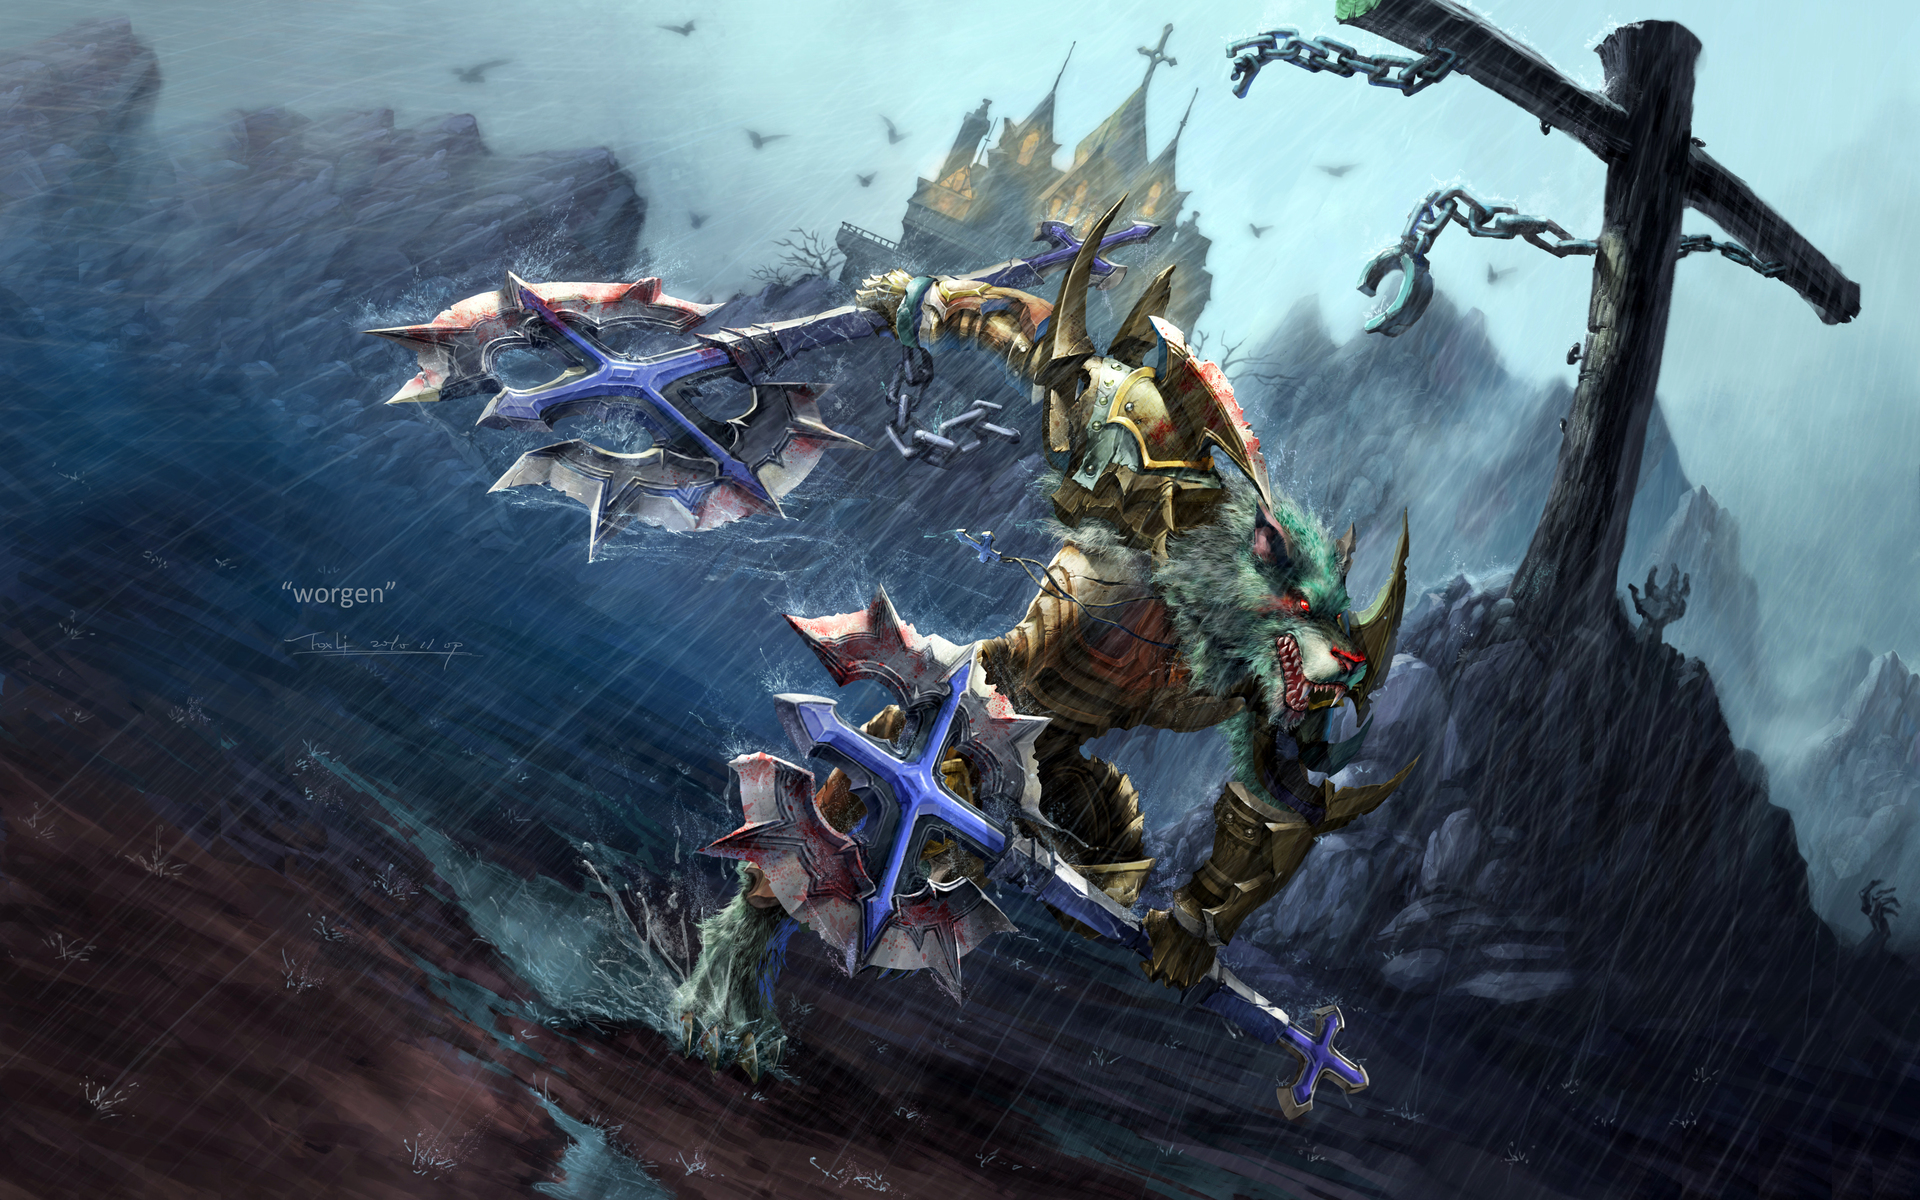 best World of Warcraft images on Pinterest Wallpaper for